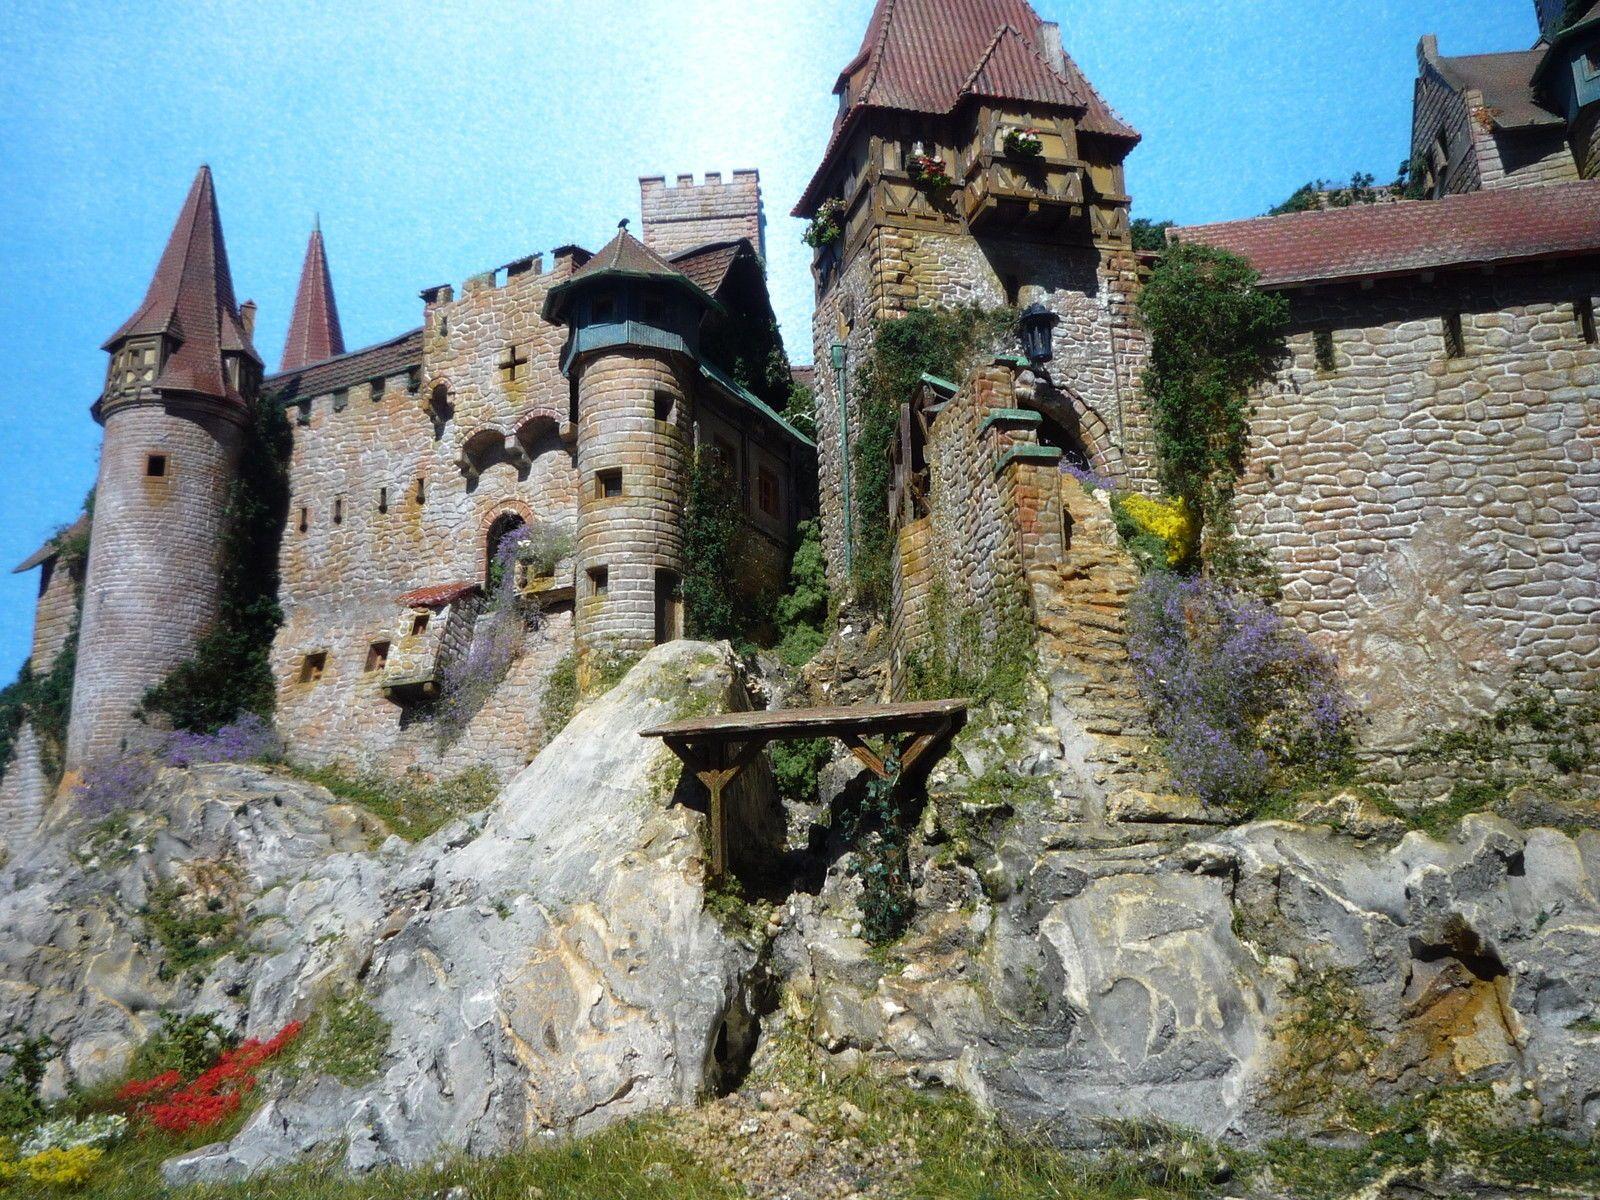 Diorama Castle Burg Schloss Elbenwald Patiniert Beleuchtung Kutsche Tren A Escala Diorama Castillos